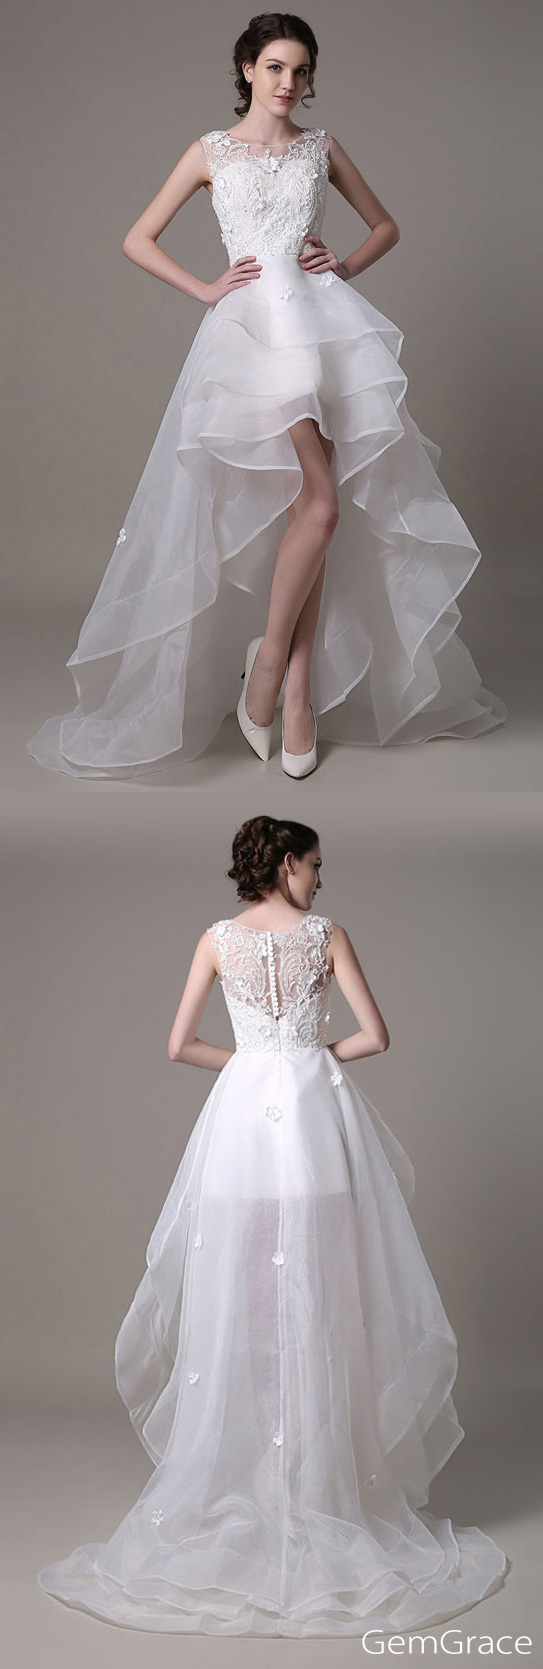 High neck wedding dresses  Elegant Sheath High Neck Kneelength Lace Wedding Dress With Lace